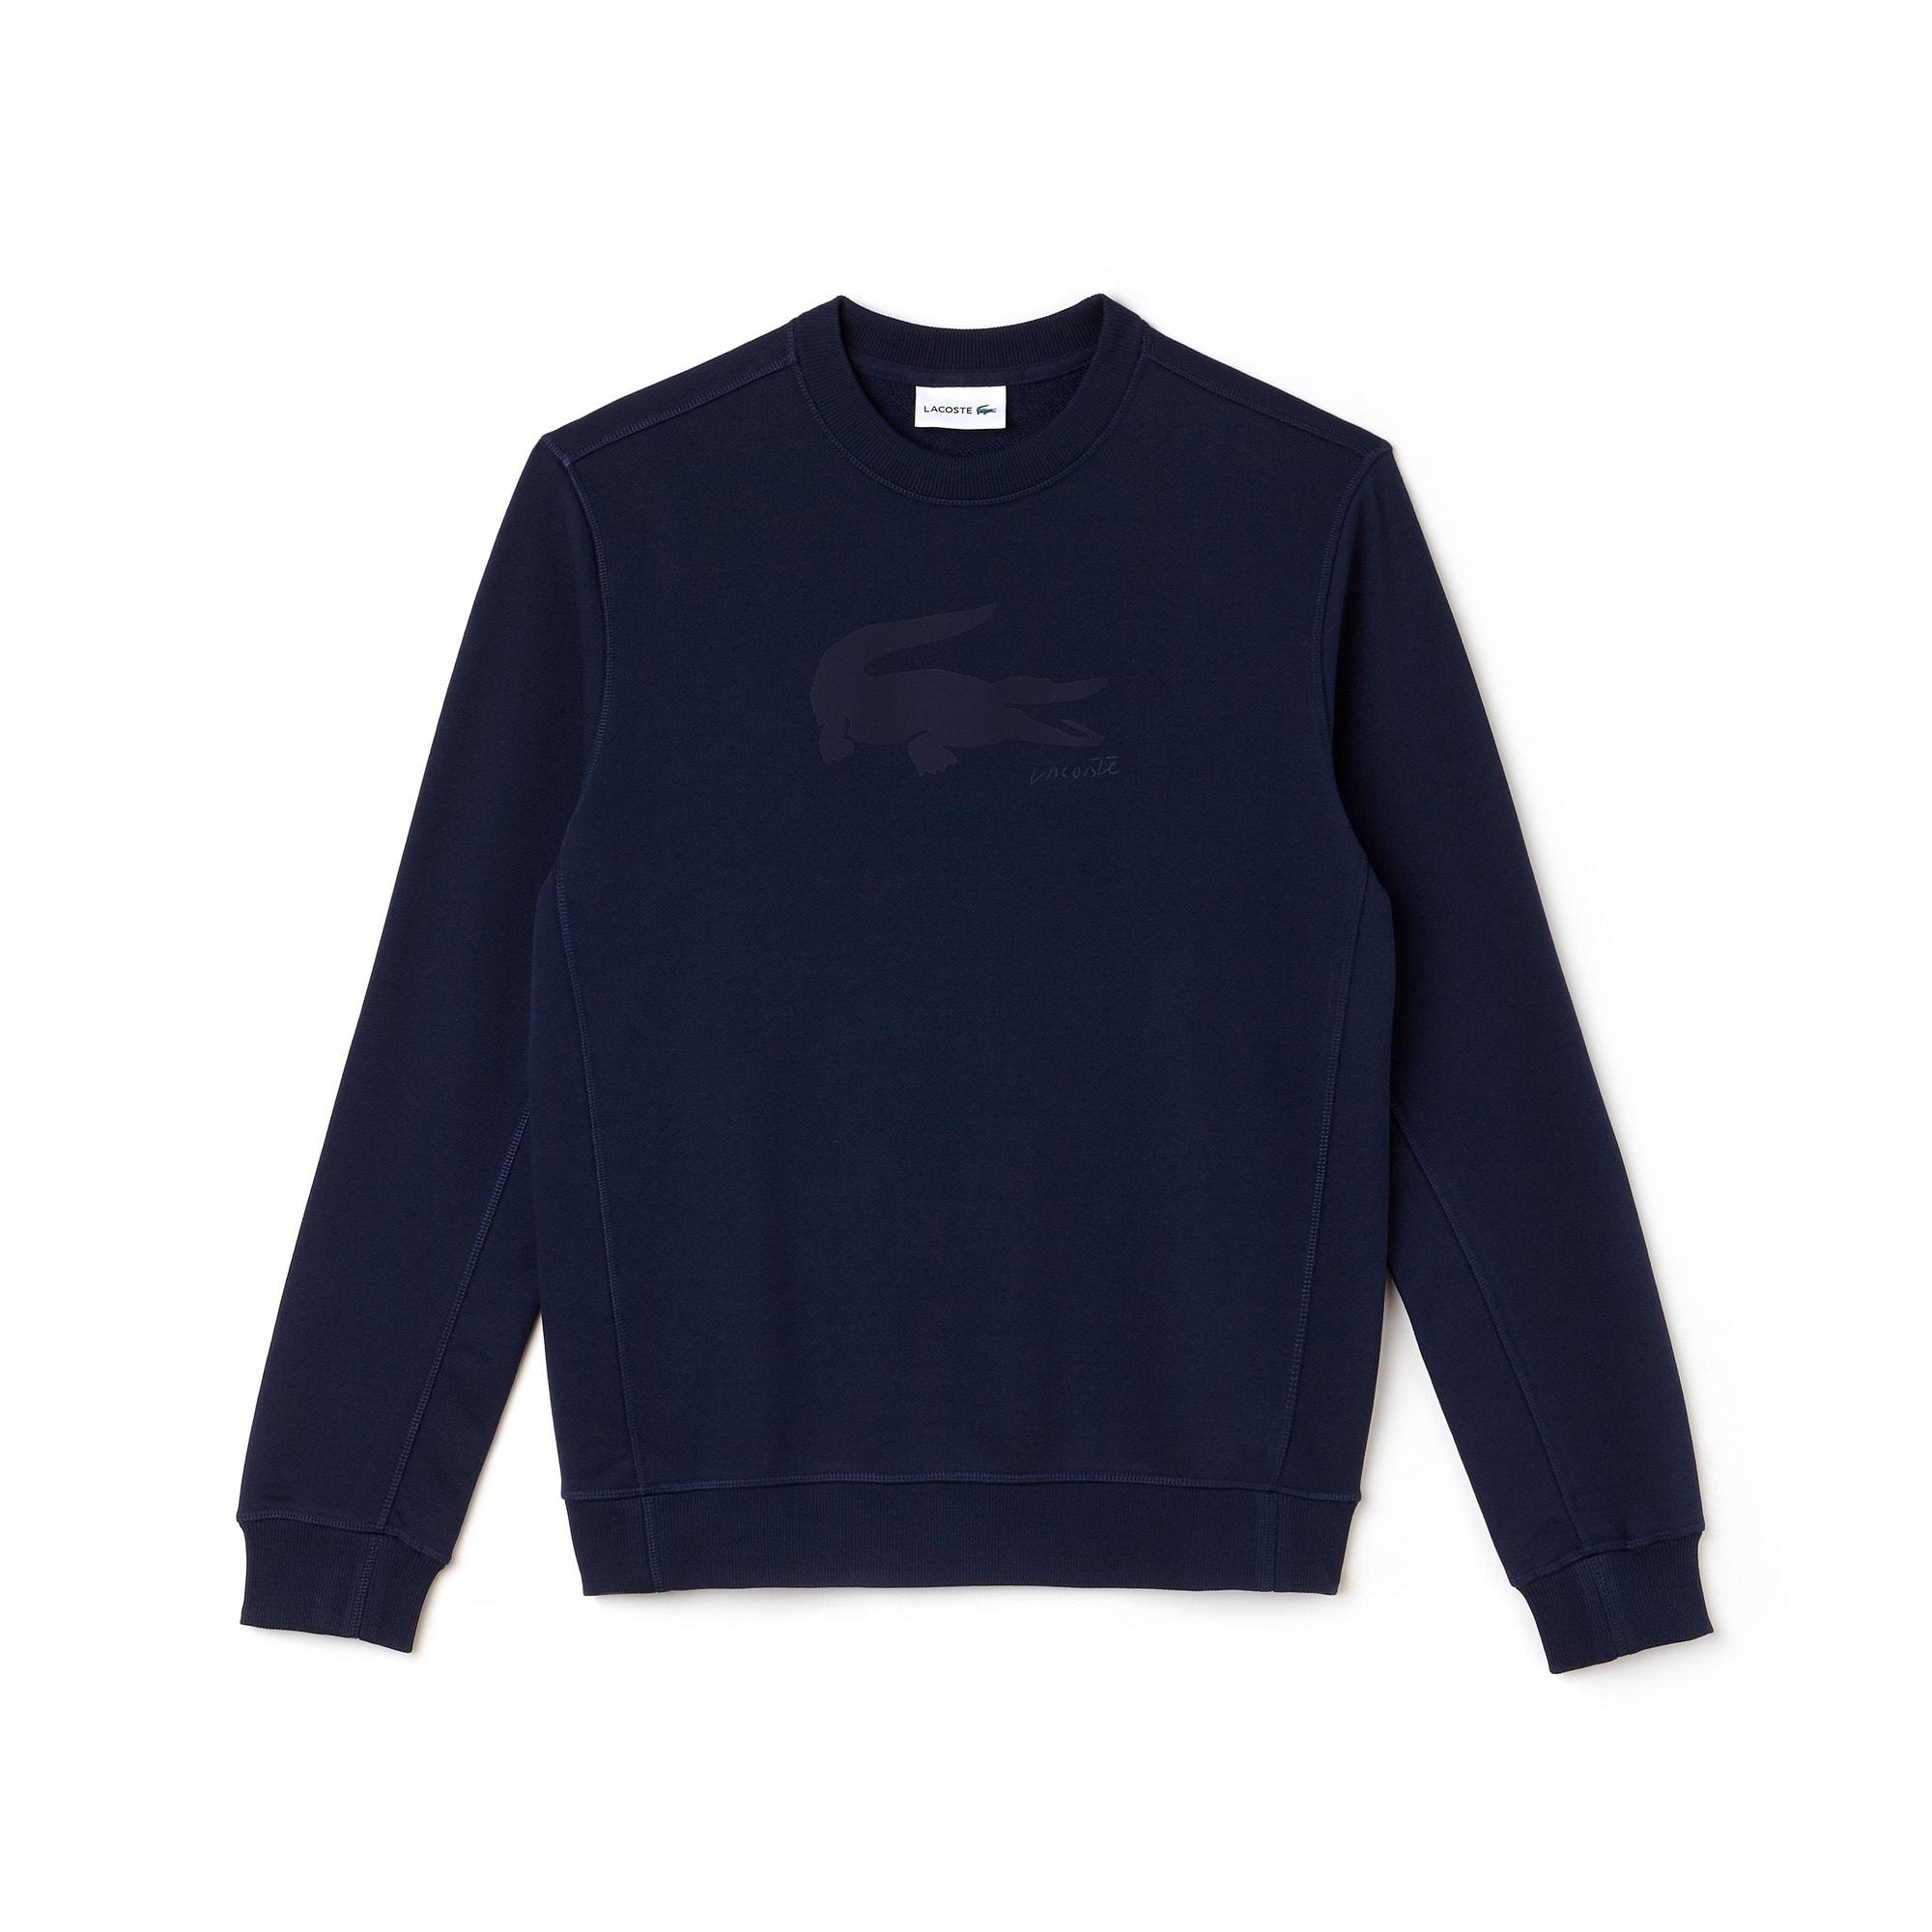 Sweatshirt col rond en molleton avec impression crocodile